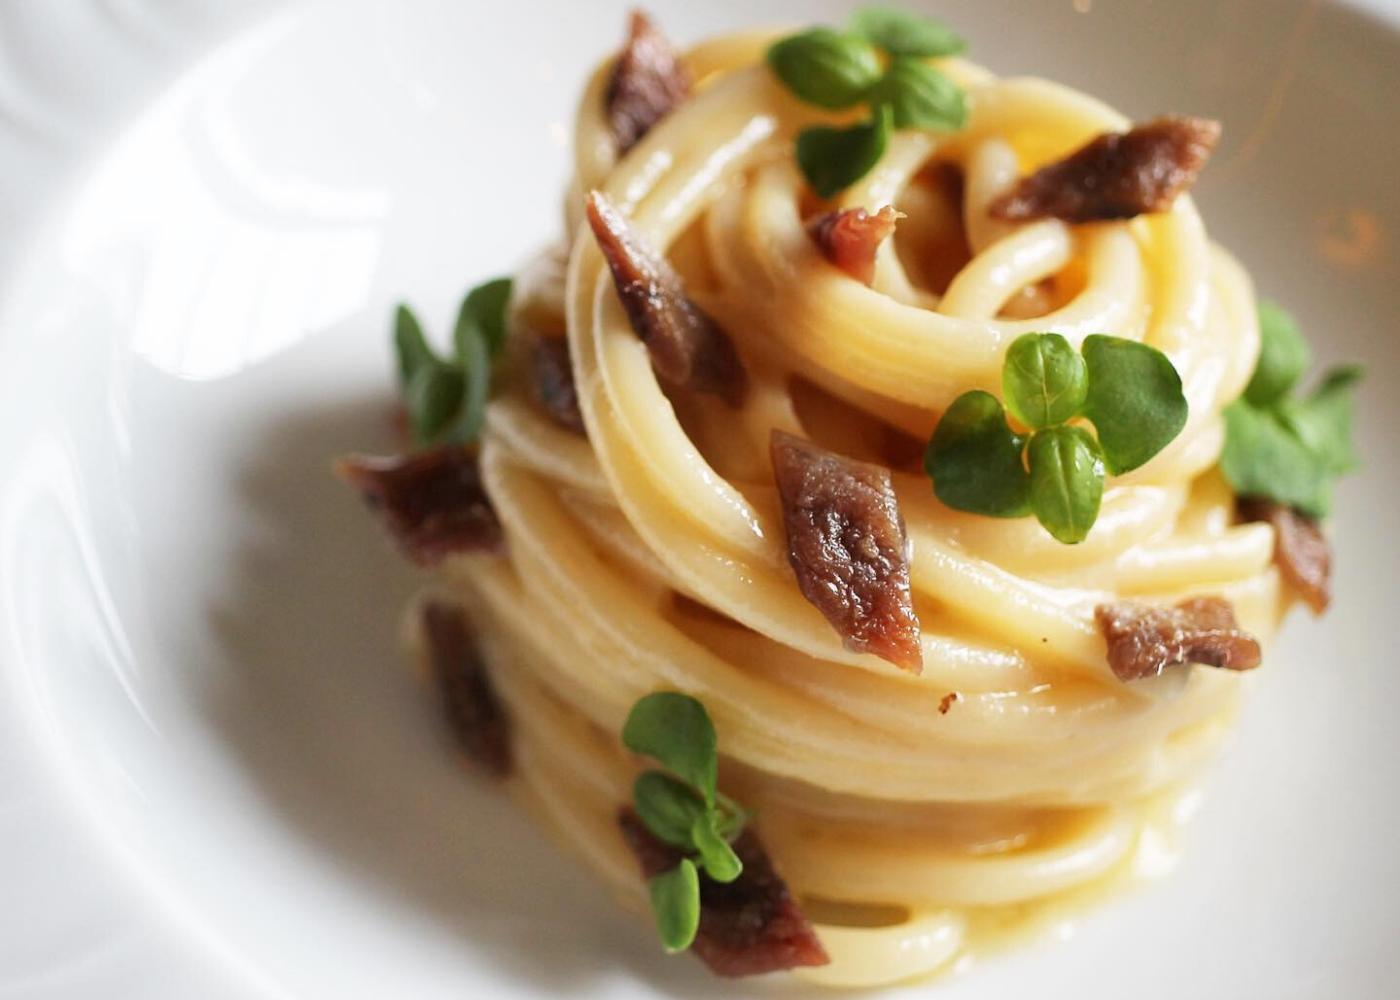 Italian restaurants in Singapore: Braci